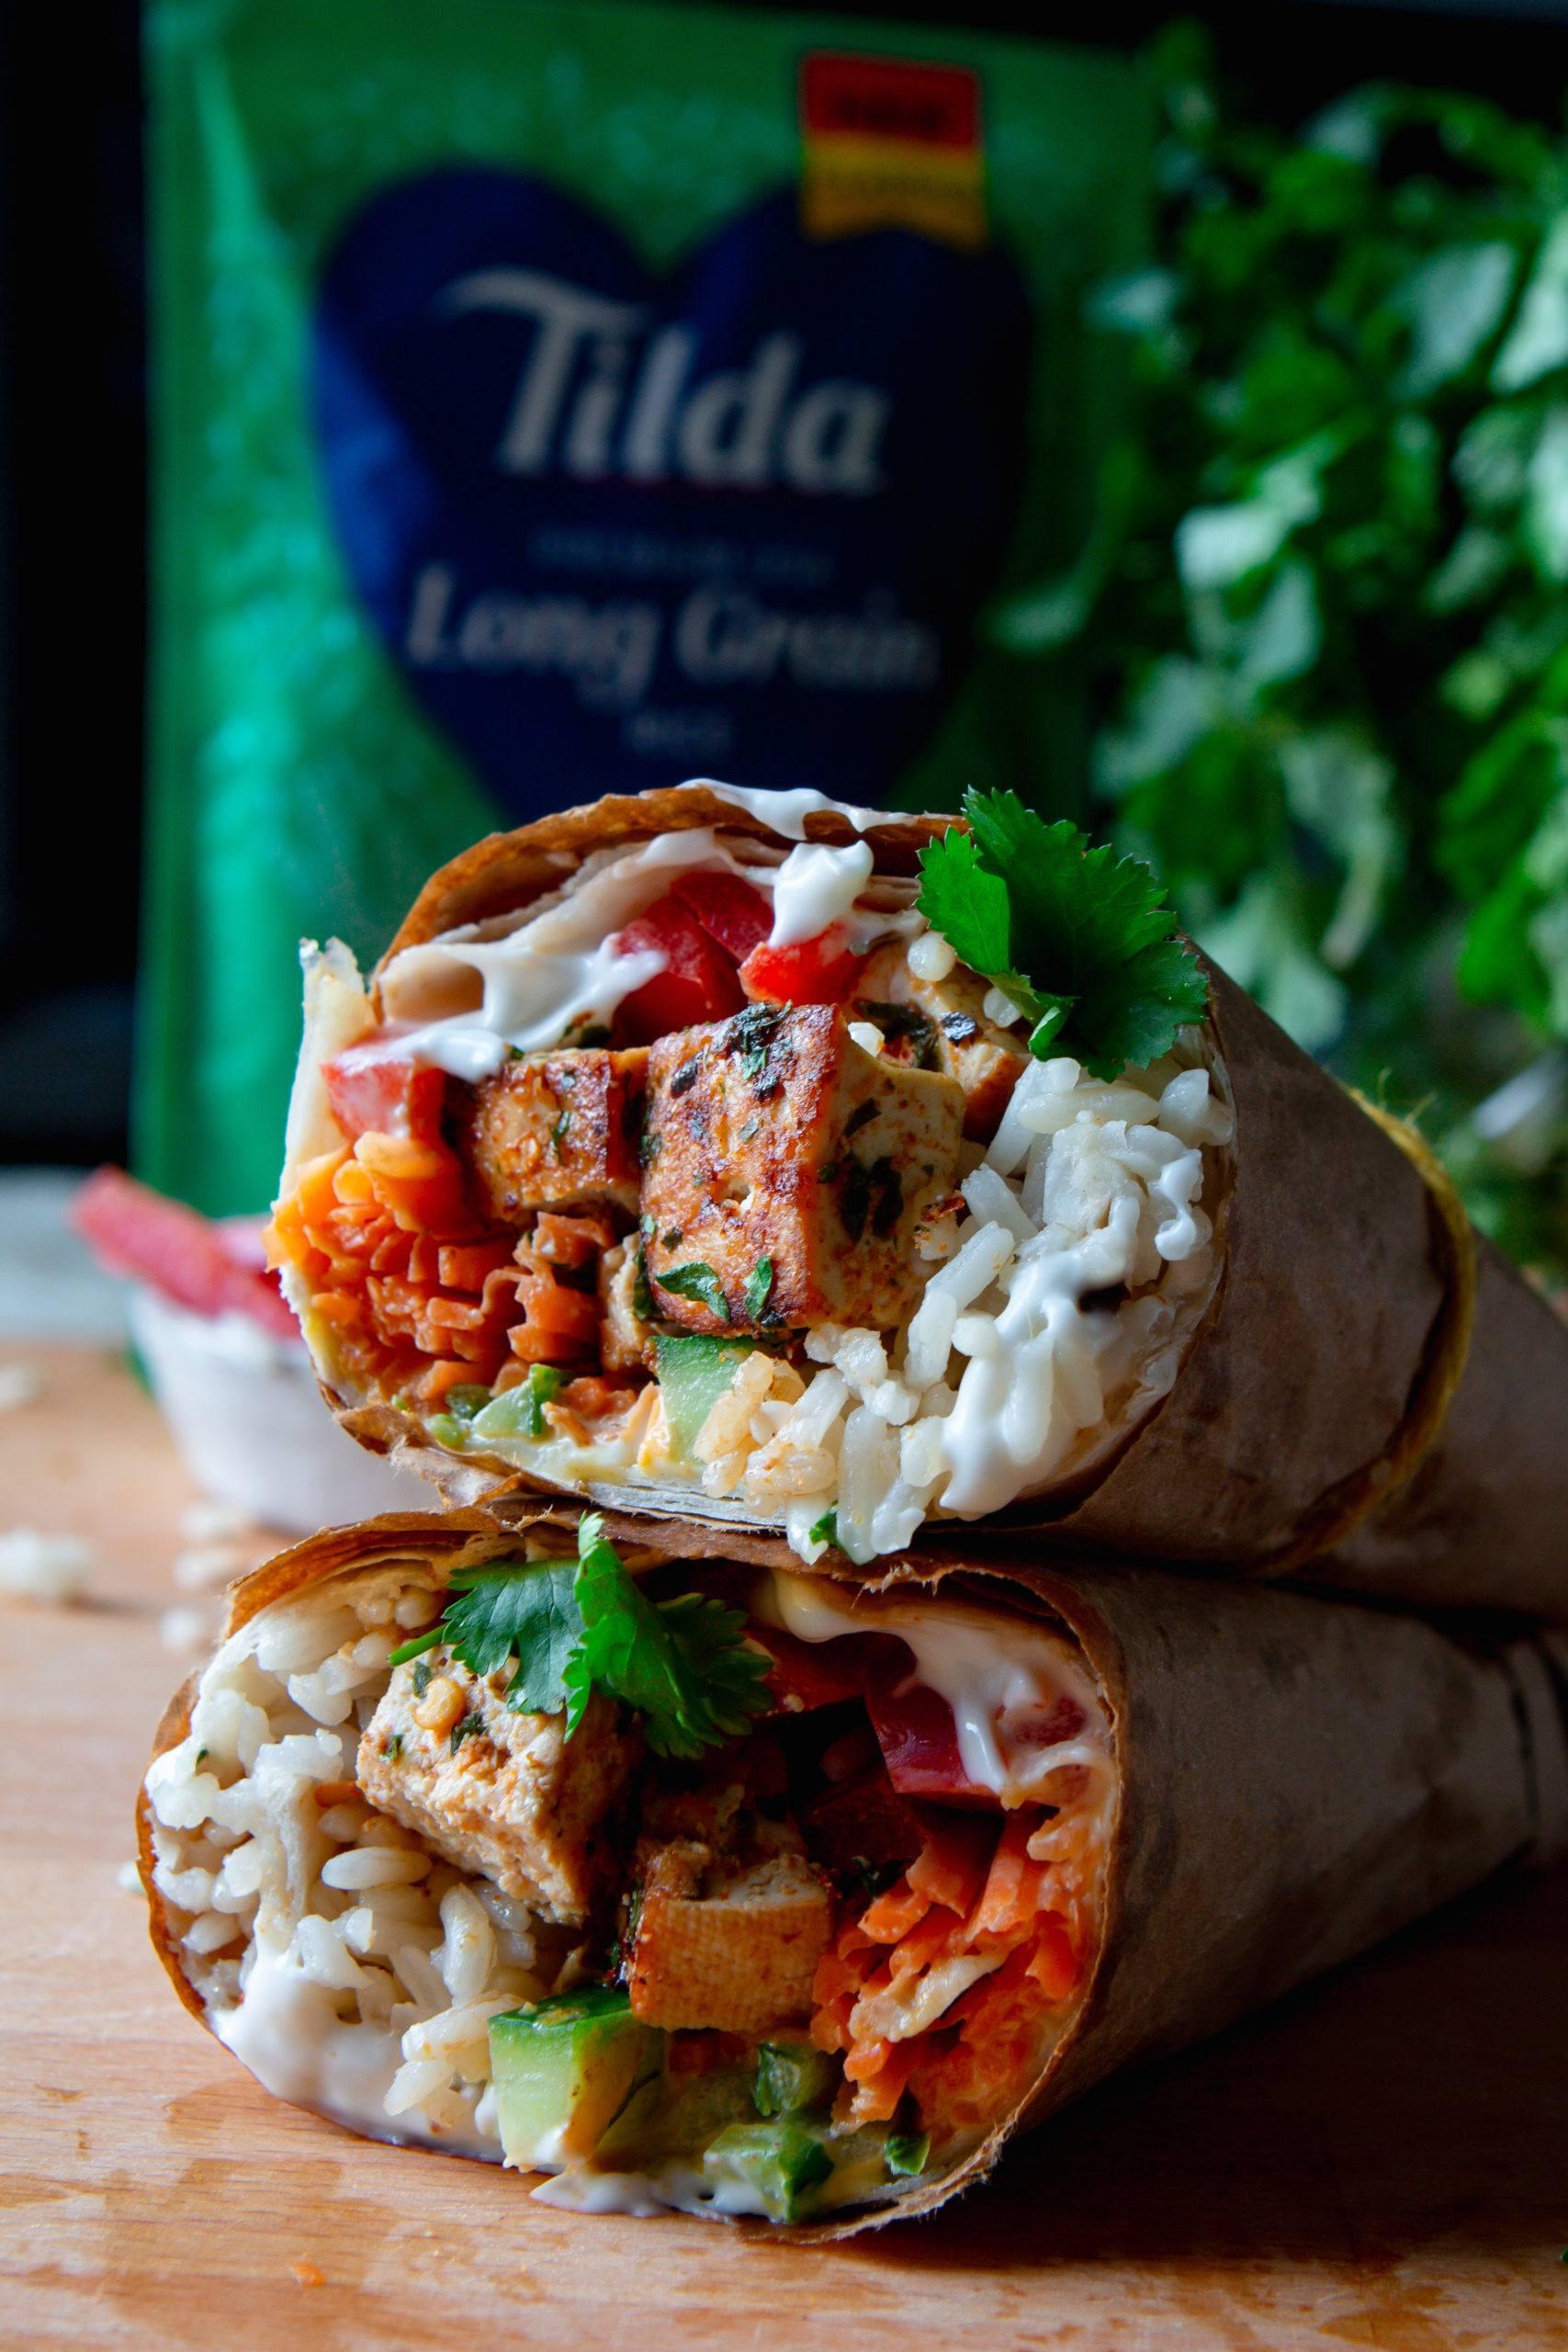 Tilda Crispy tofu burrito vegan